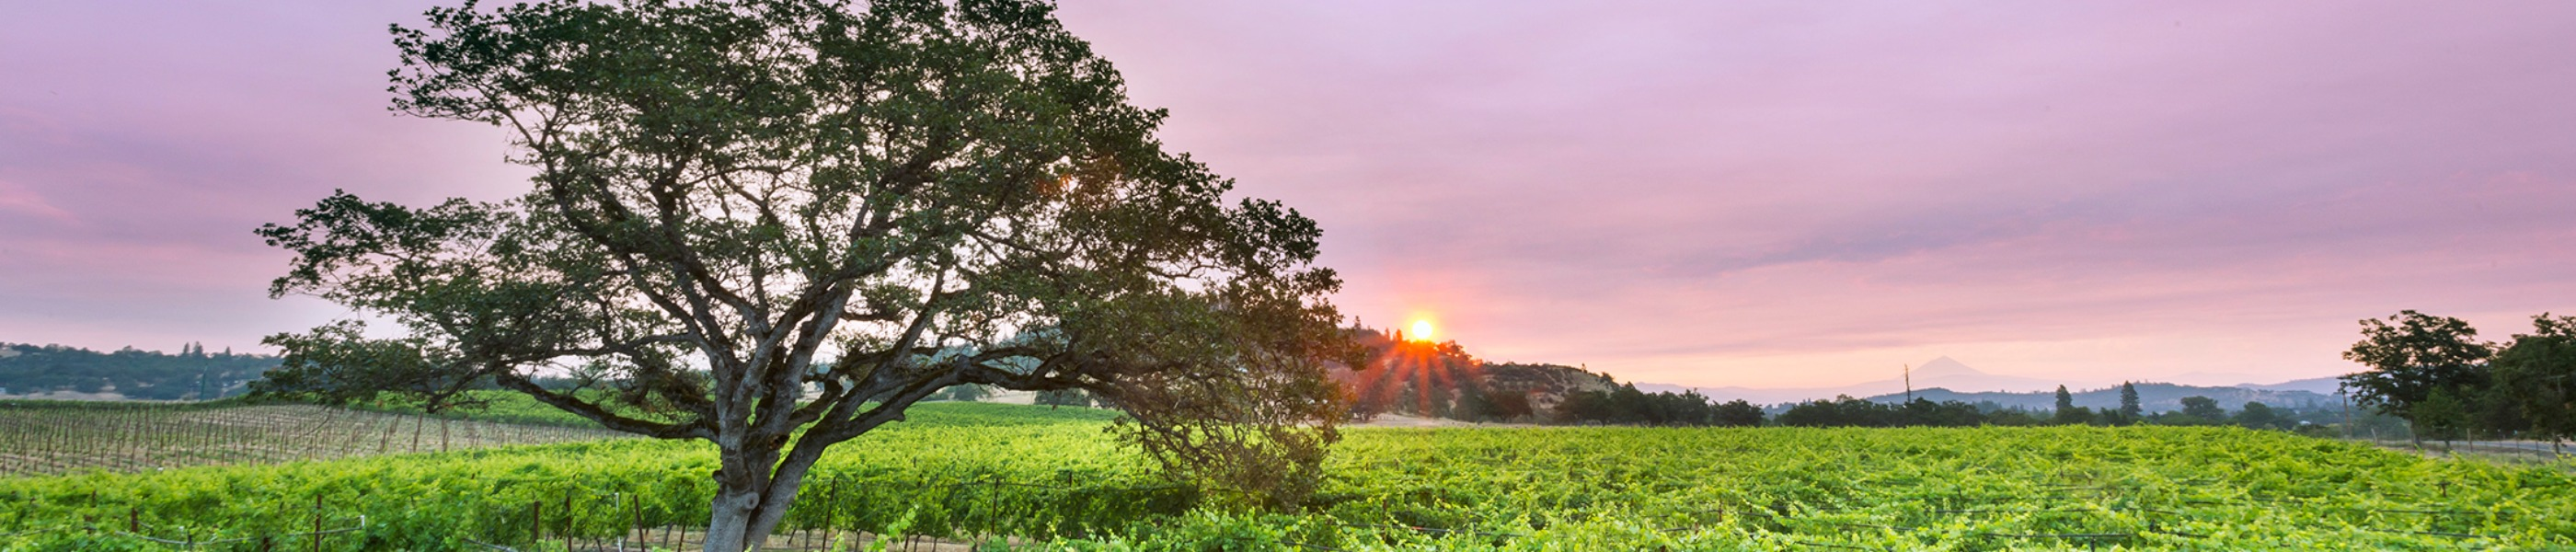 Southern Oregon's breathtaking sunset over Agate Ridge Vineyards